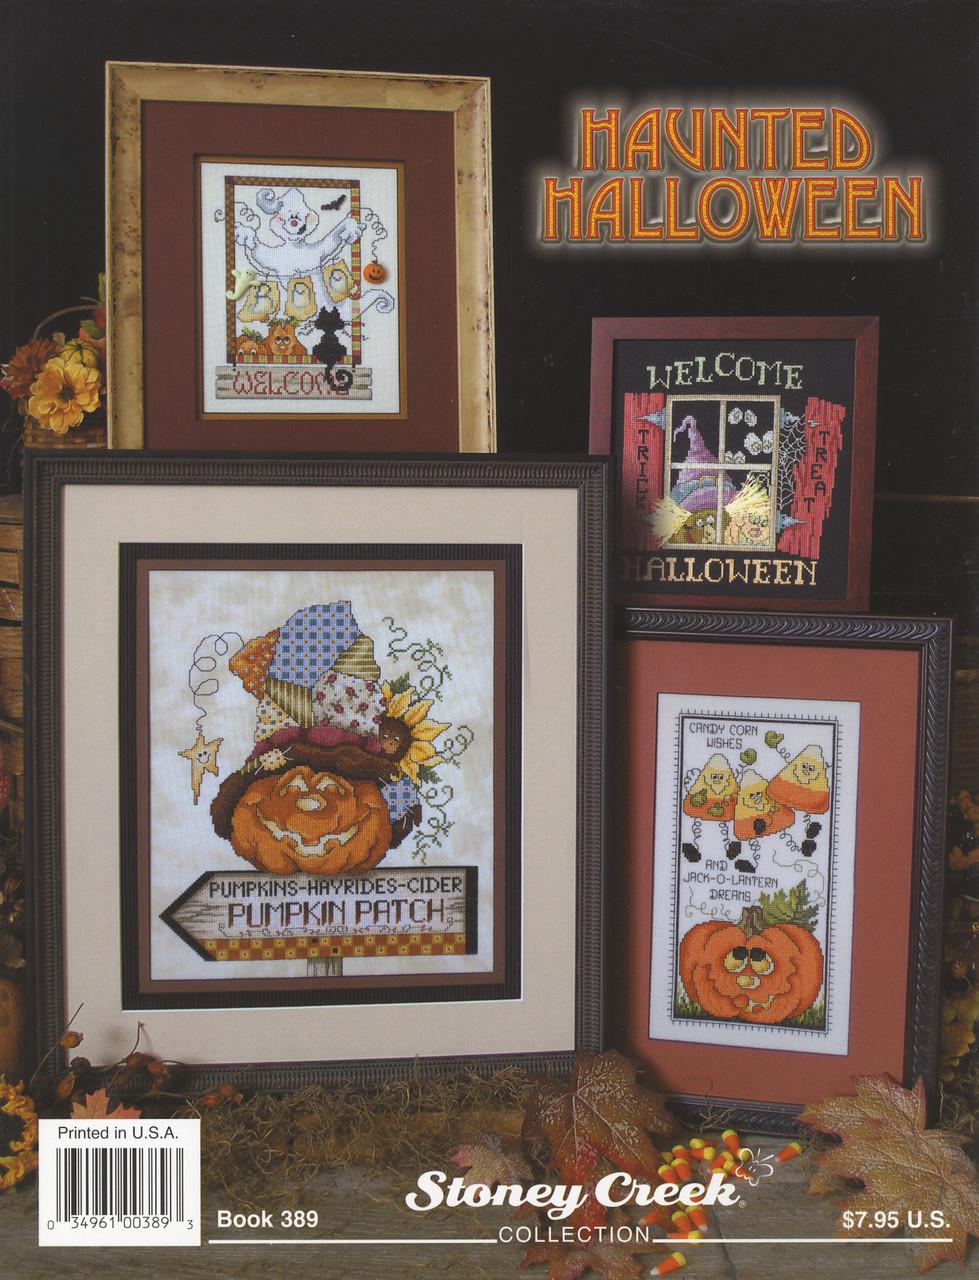 Stoney Creek - Haunted Halloween